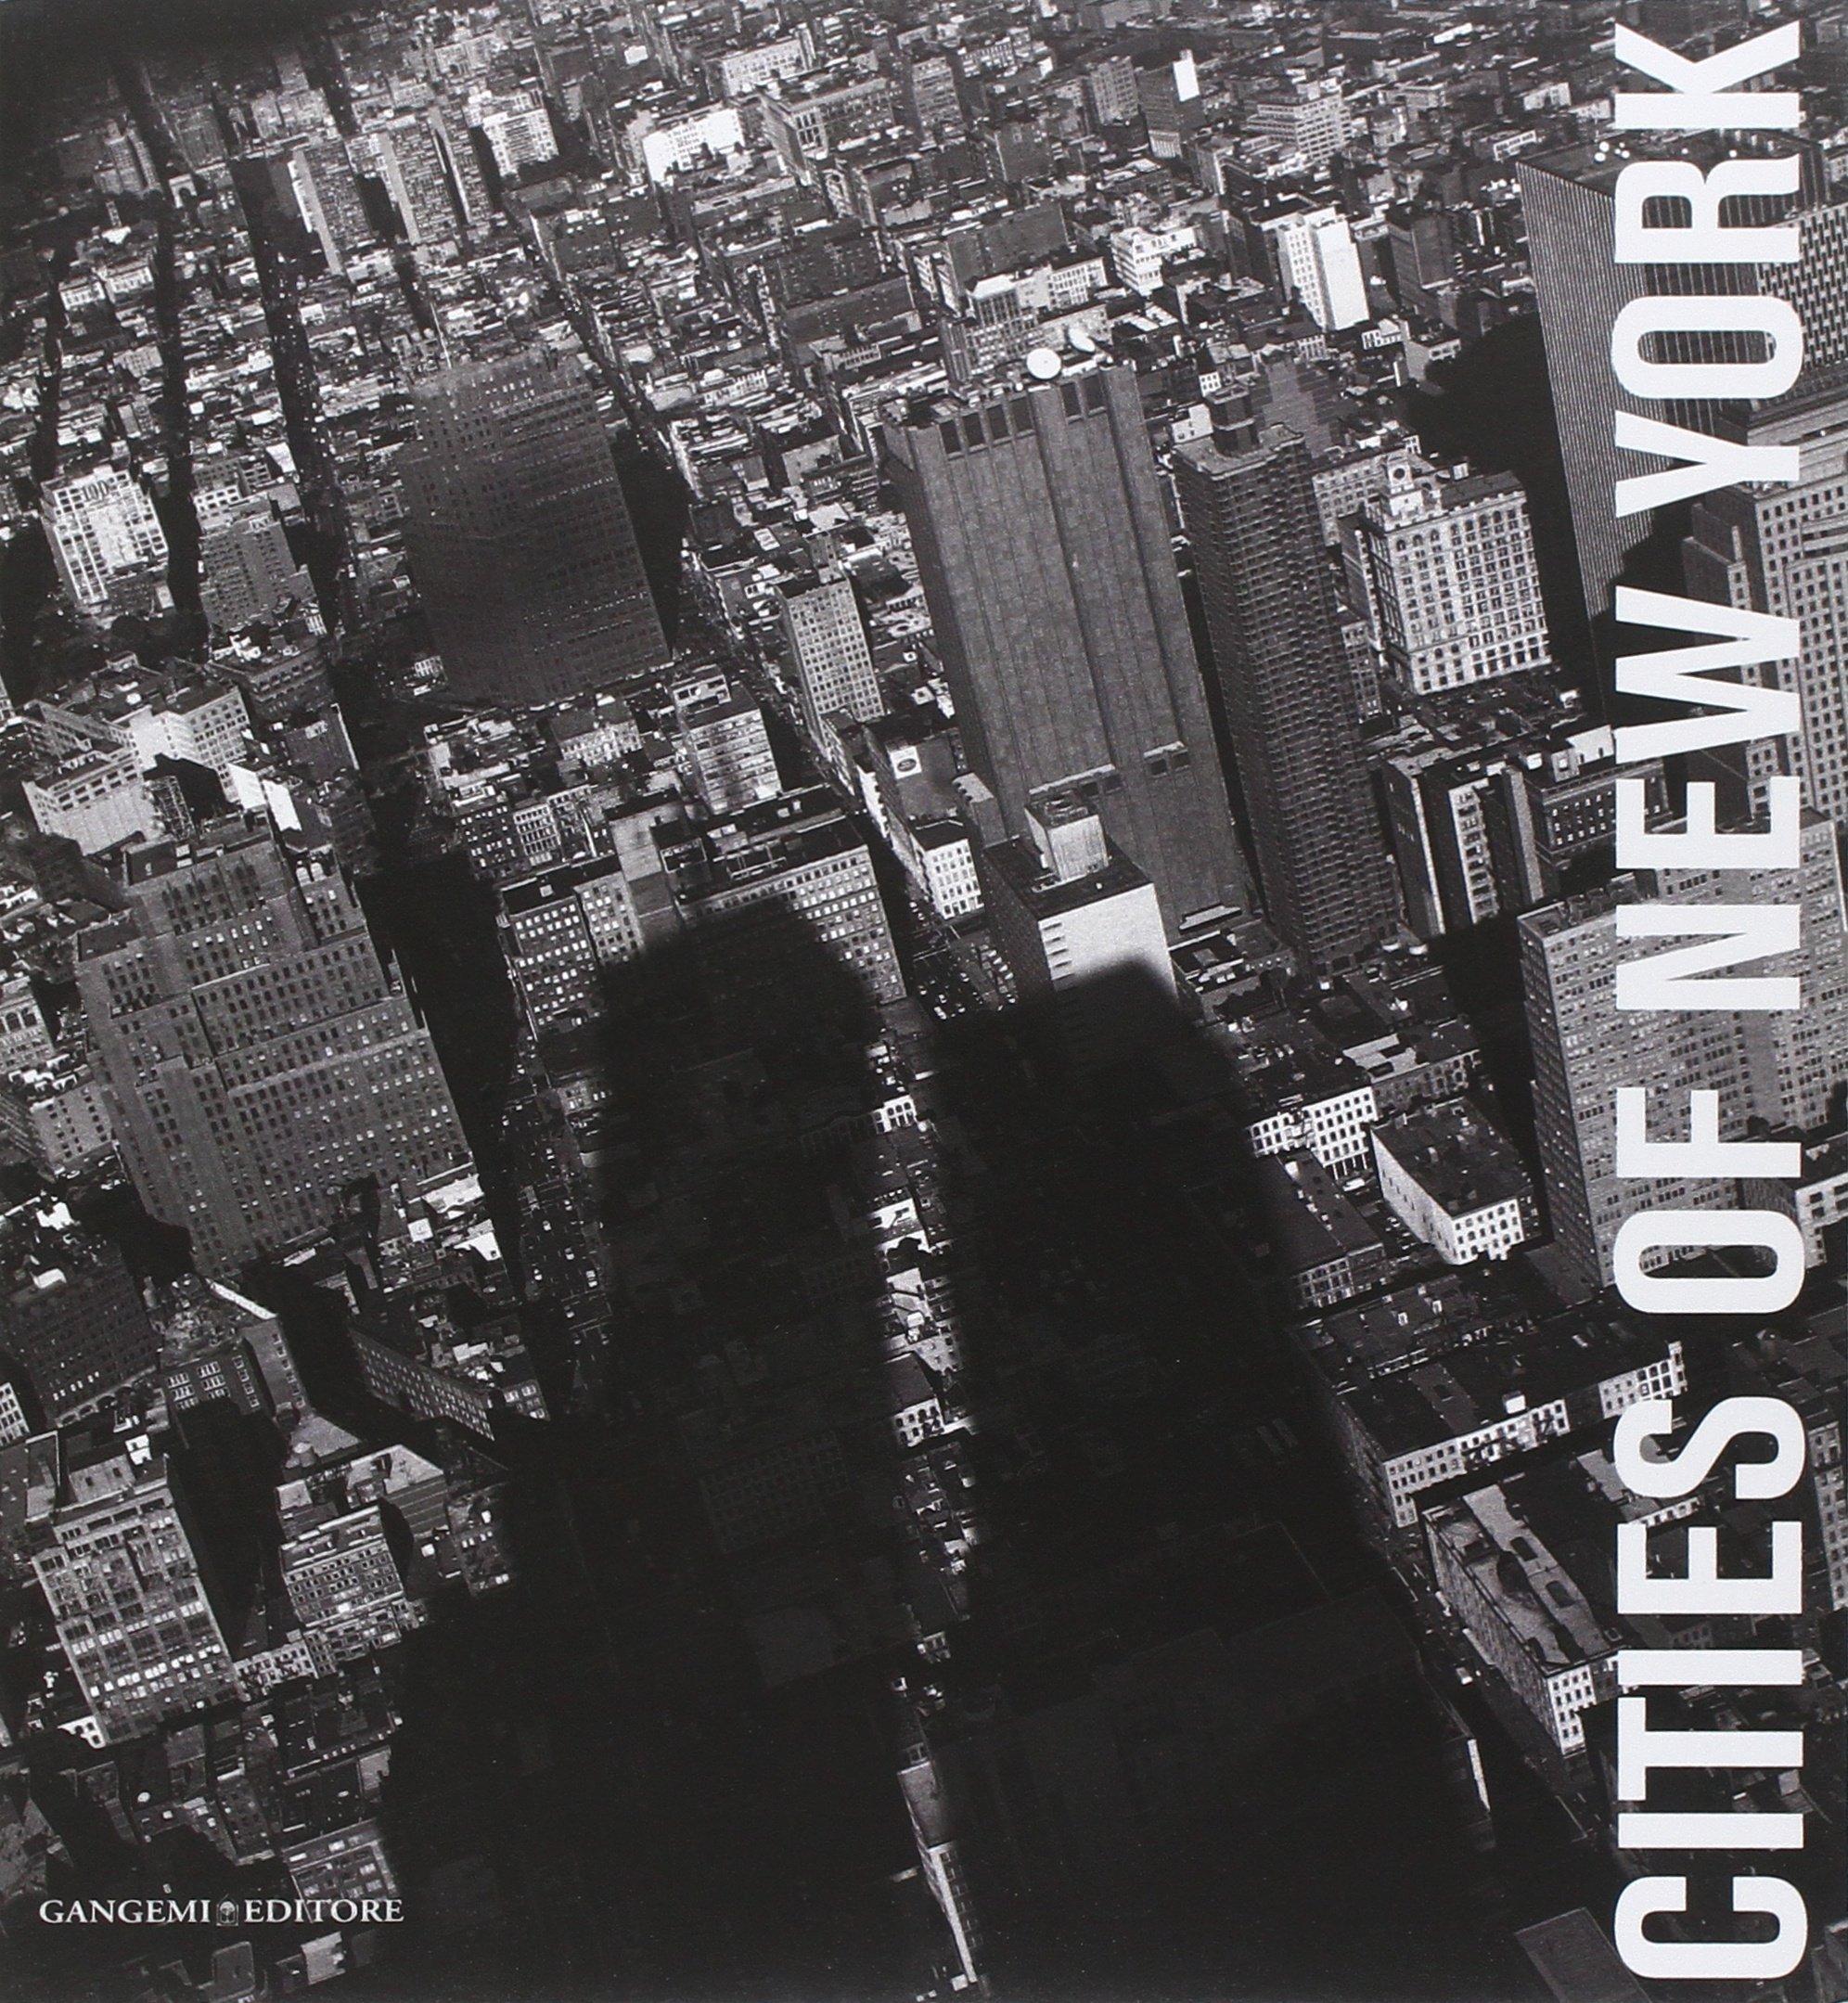 Cities of New York Copertina flessibile – 2 set 2011 M. Cerretelli Gangemi 8849222025 ARCHITETTURA